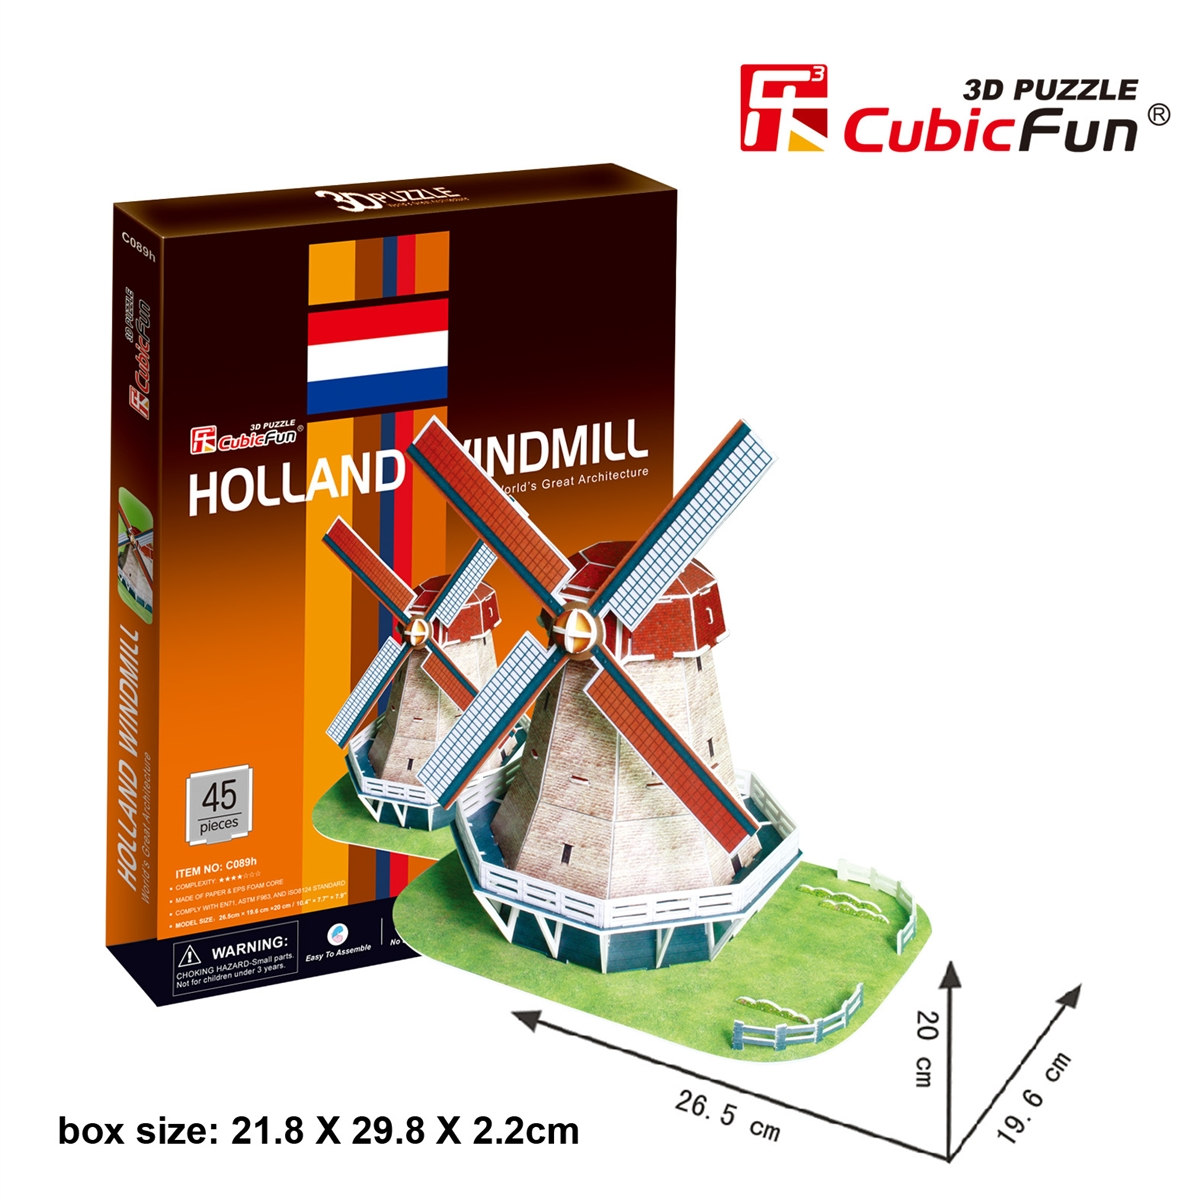 Holland Windmill กังหันลมวินด์มิลล์ CubicFun 3D Puzzle 53 Pieces Size 26.5*19.6*20 cm.